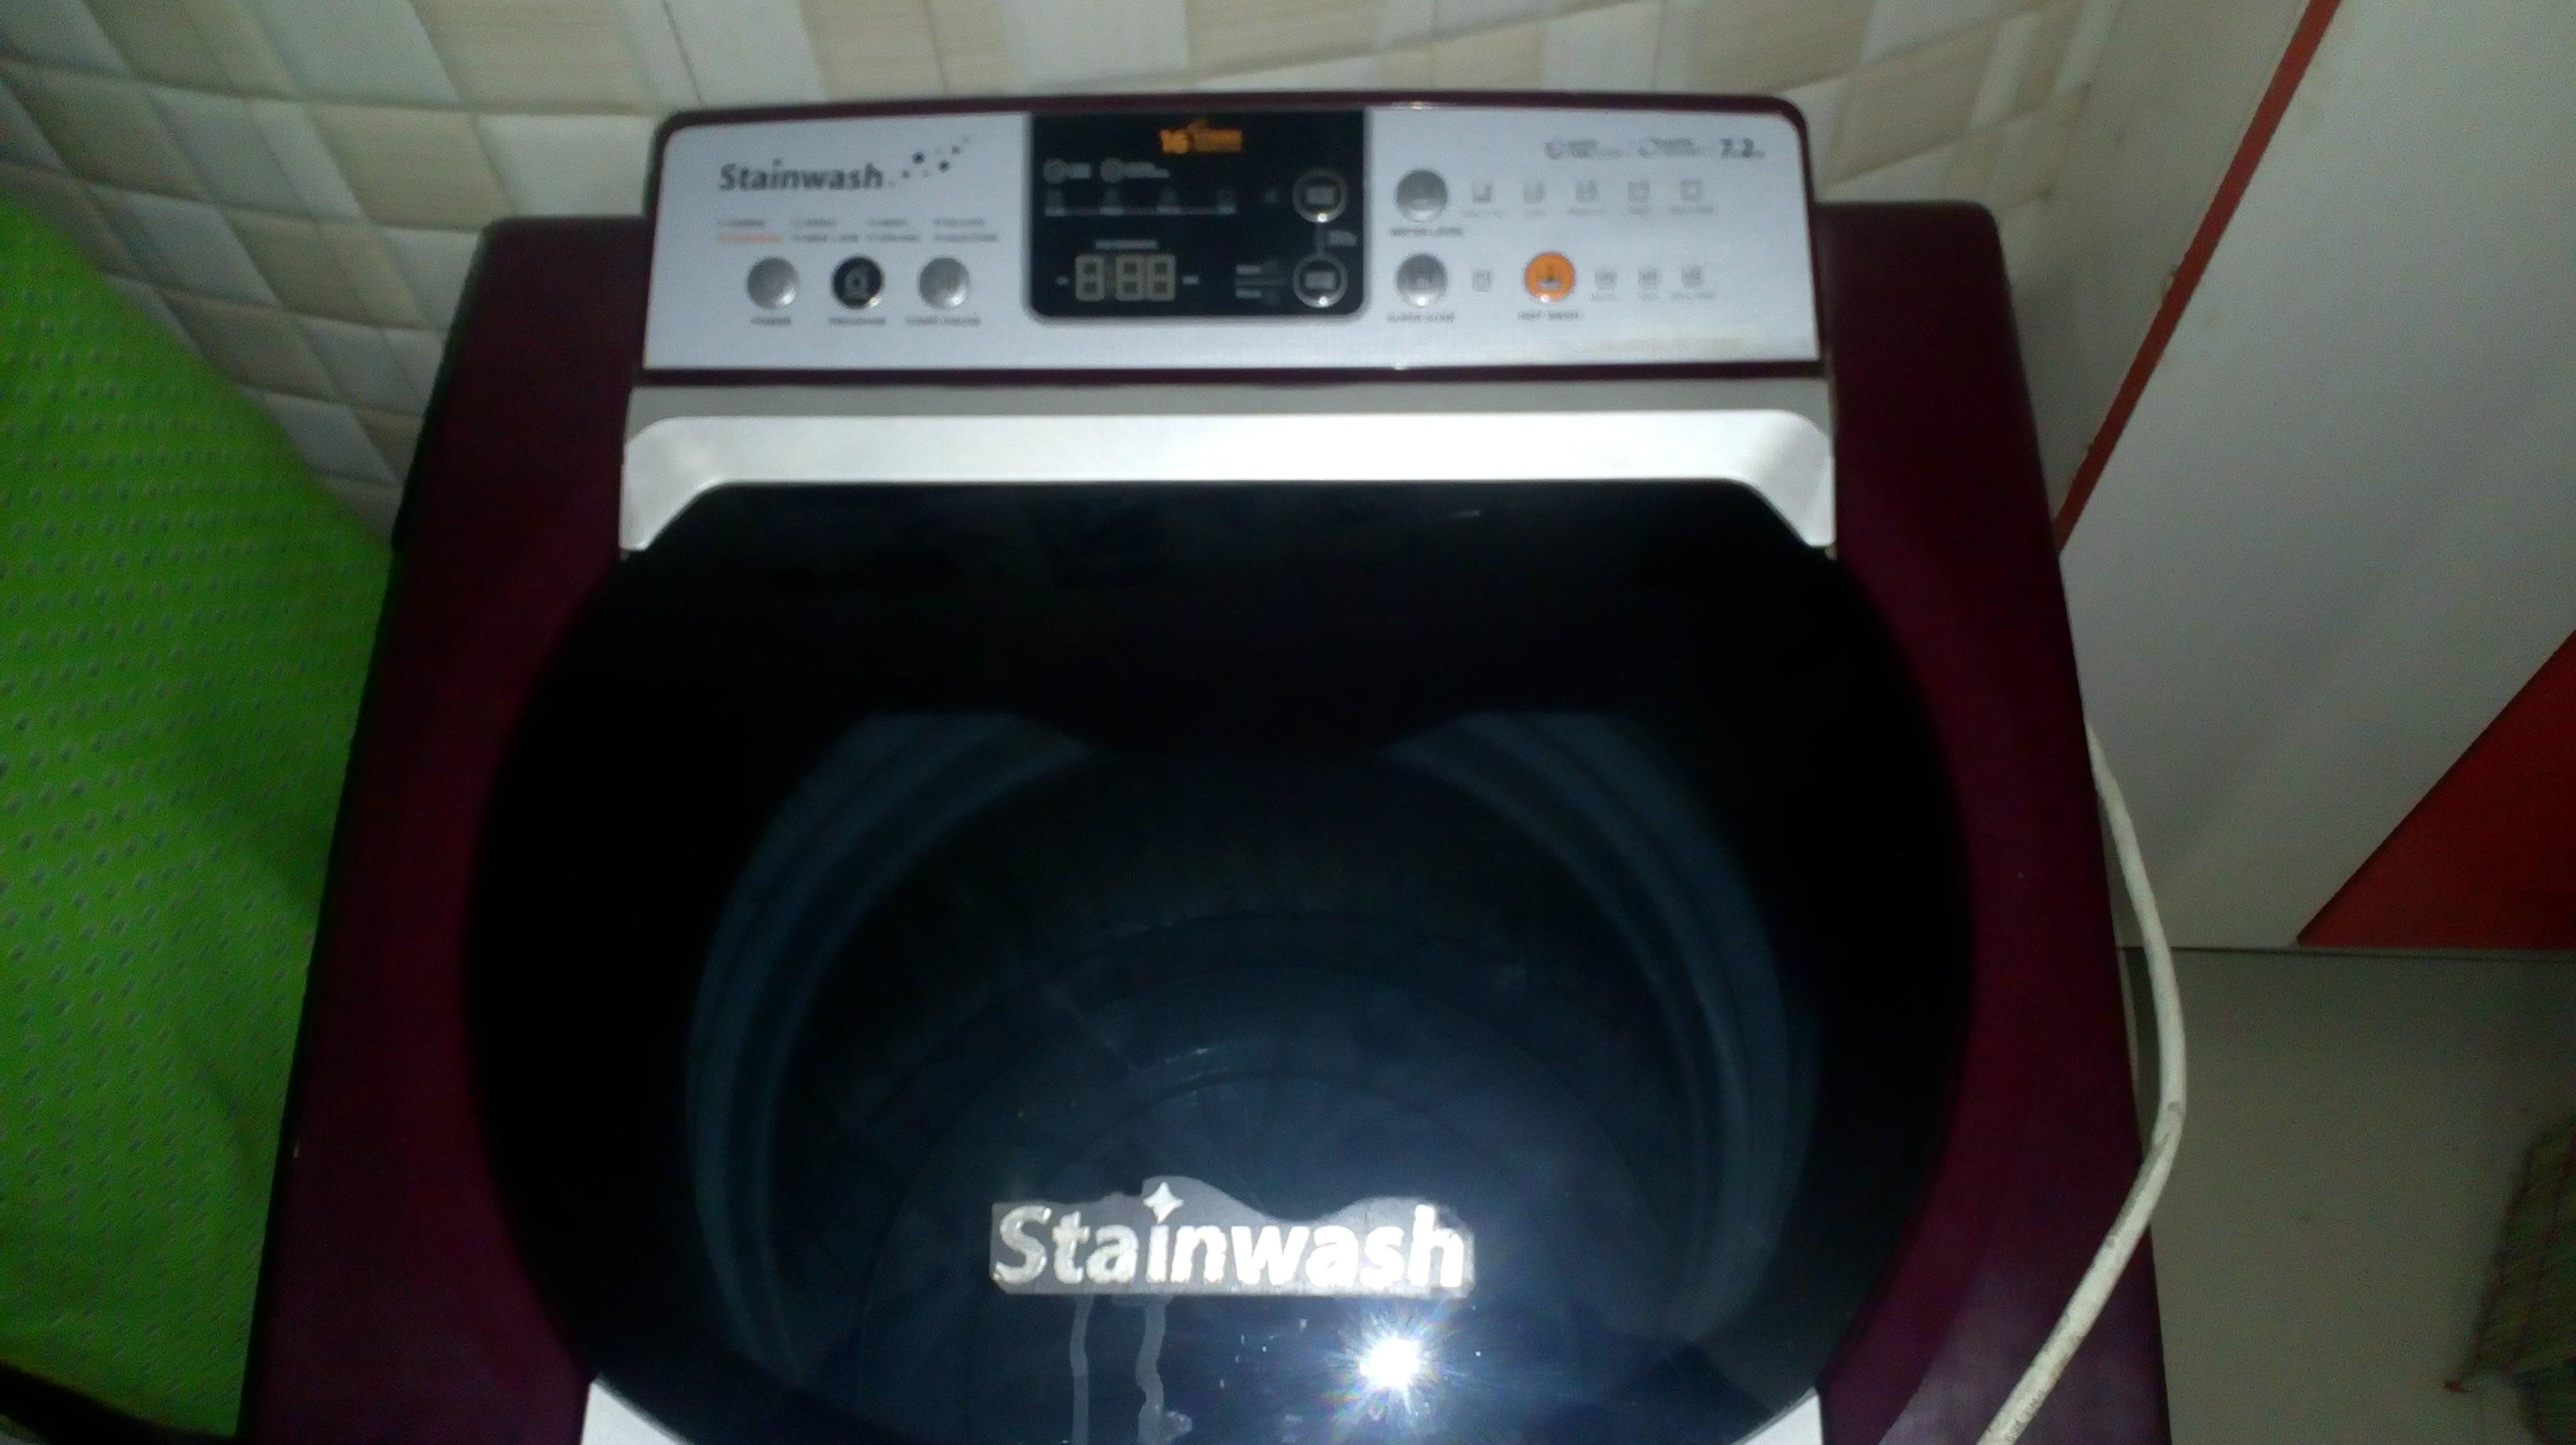 Whirlpool Bad Vergelijk : Not satisfactory product whirlpool stainwash deep clean